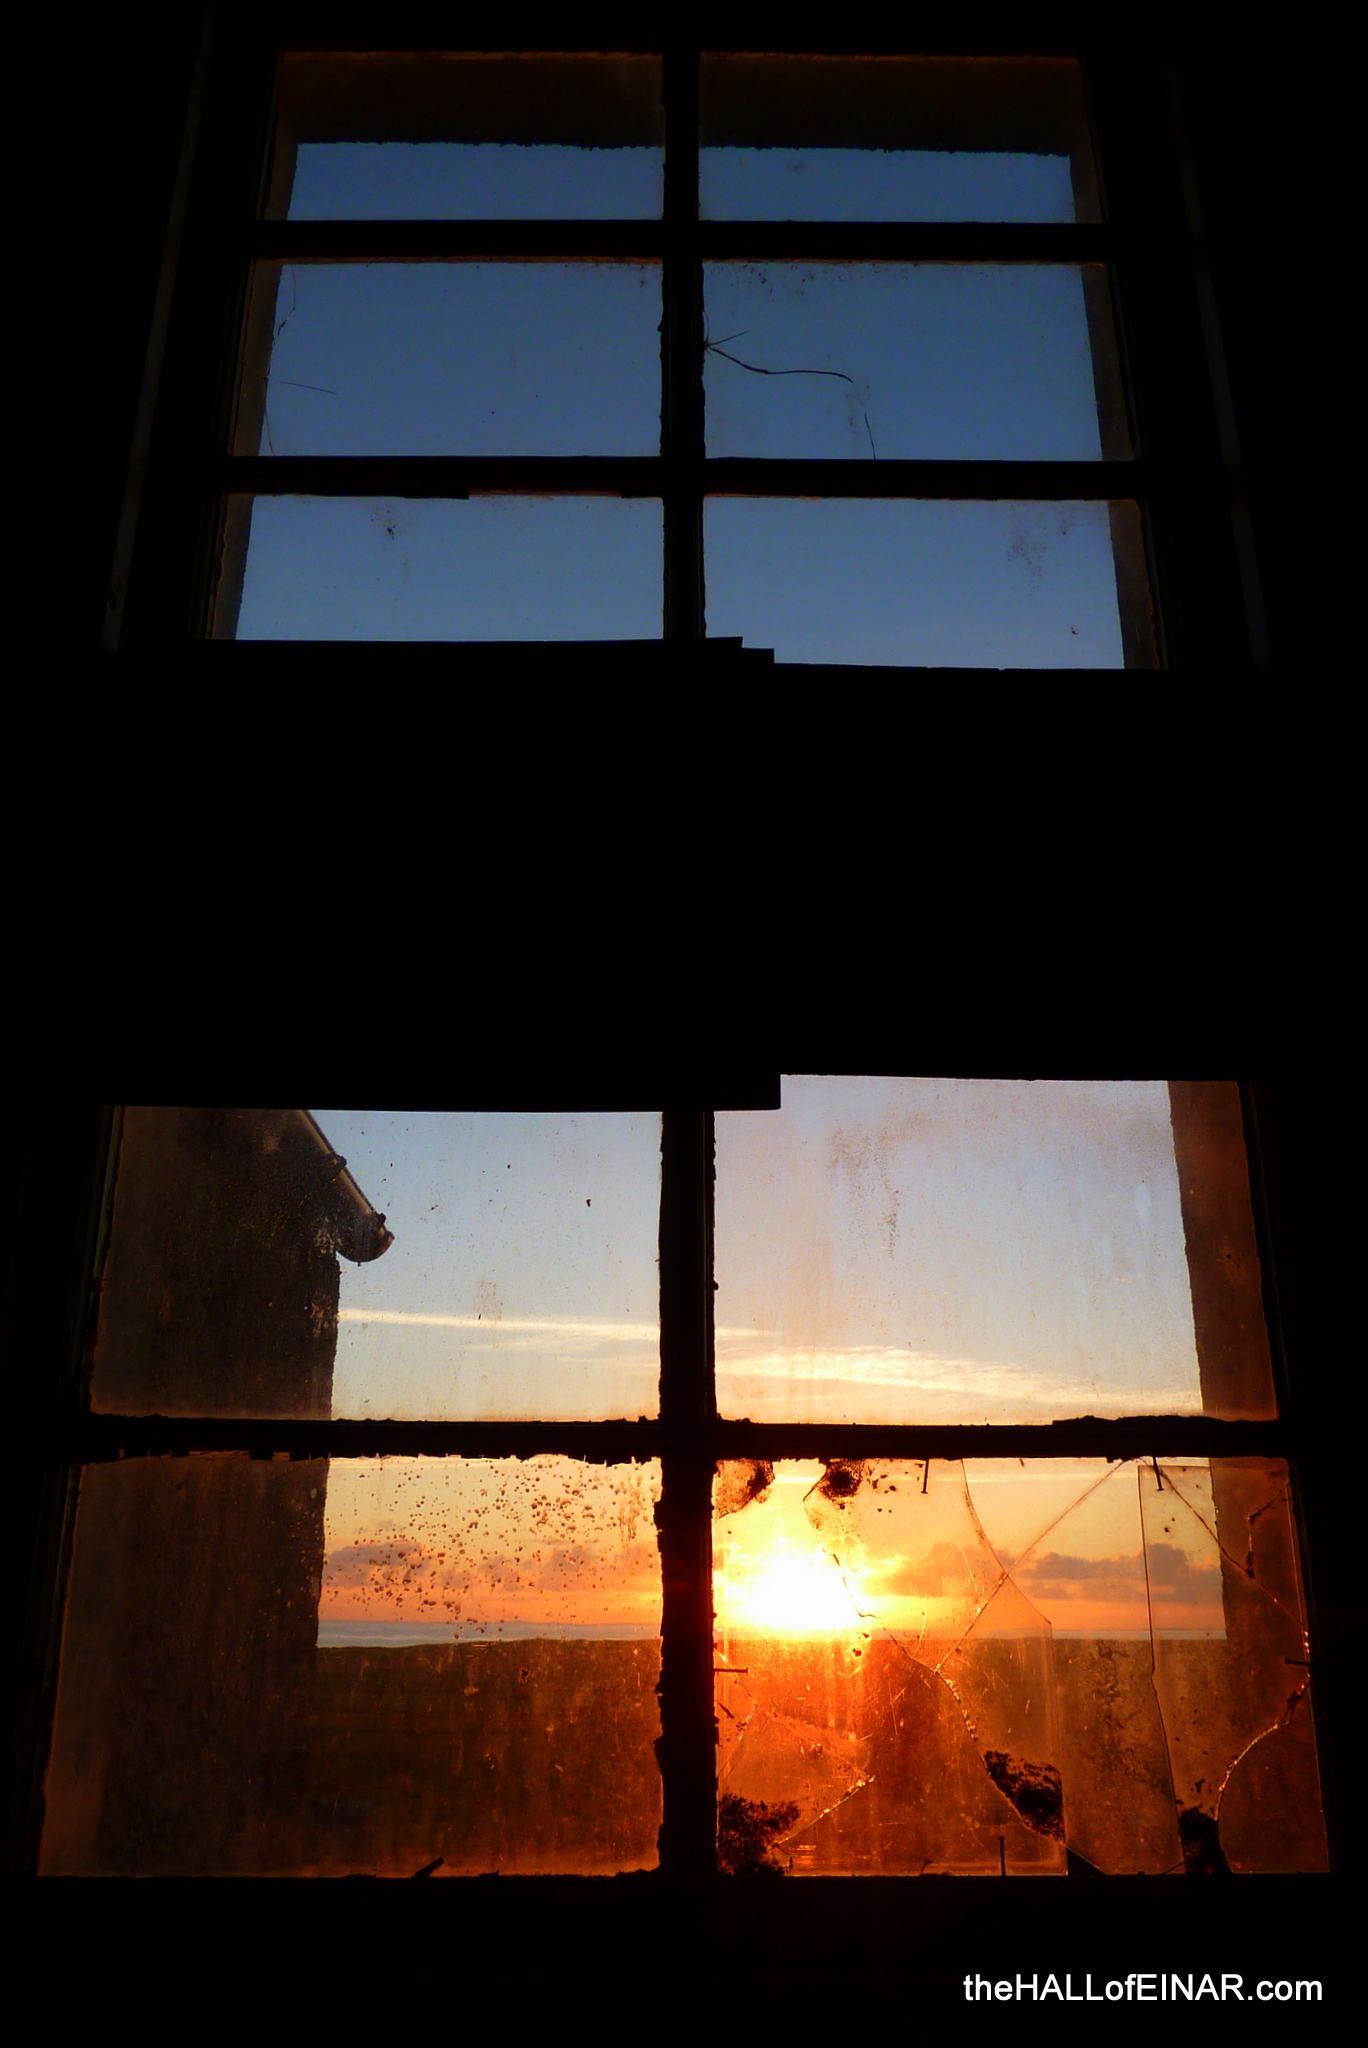 Sunrise through broken windows - photograph (c) 2016 David Bailey (not the)